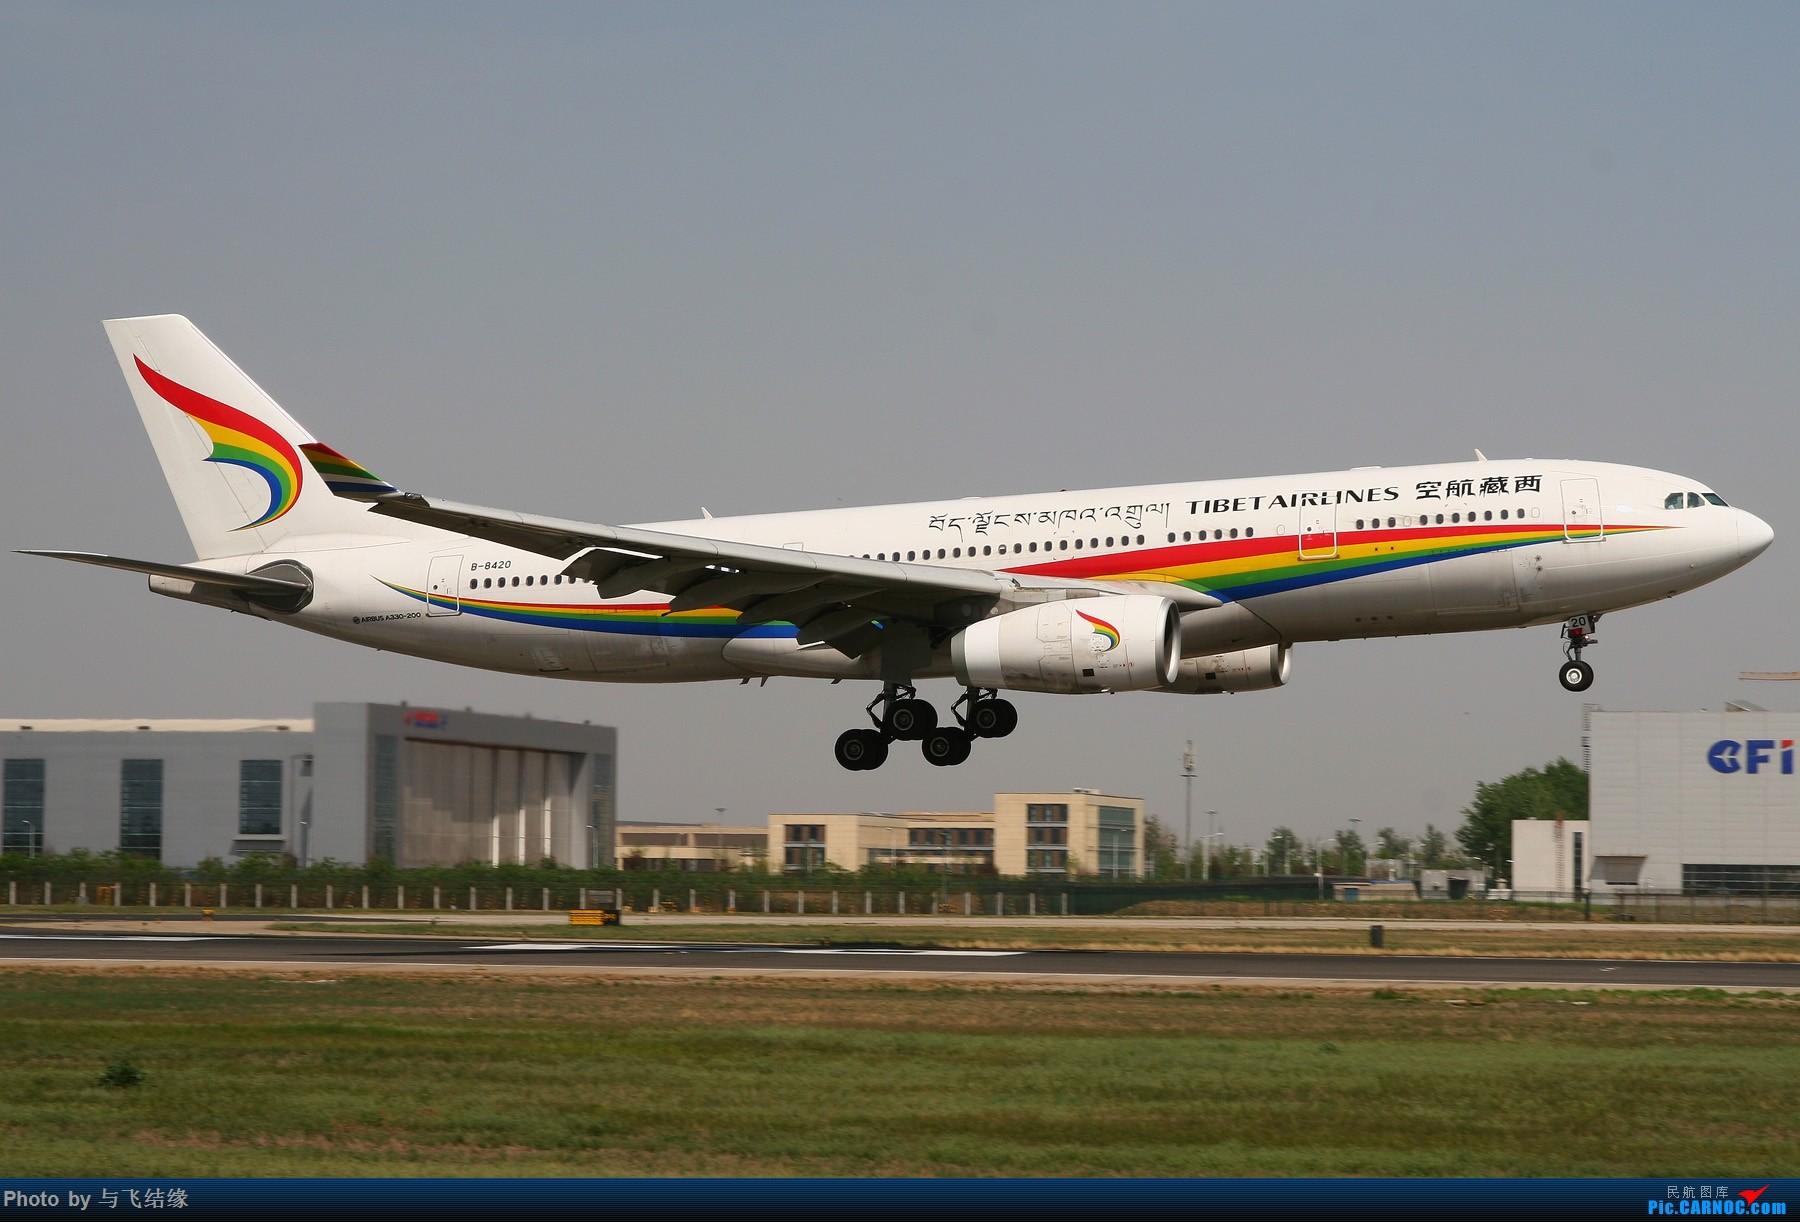 Re:西藏航空Airbus A330-200,B-8420组图。 AIRBUS A330-200 B-8420 中国北京首都国际机场